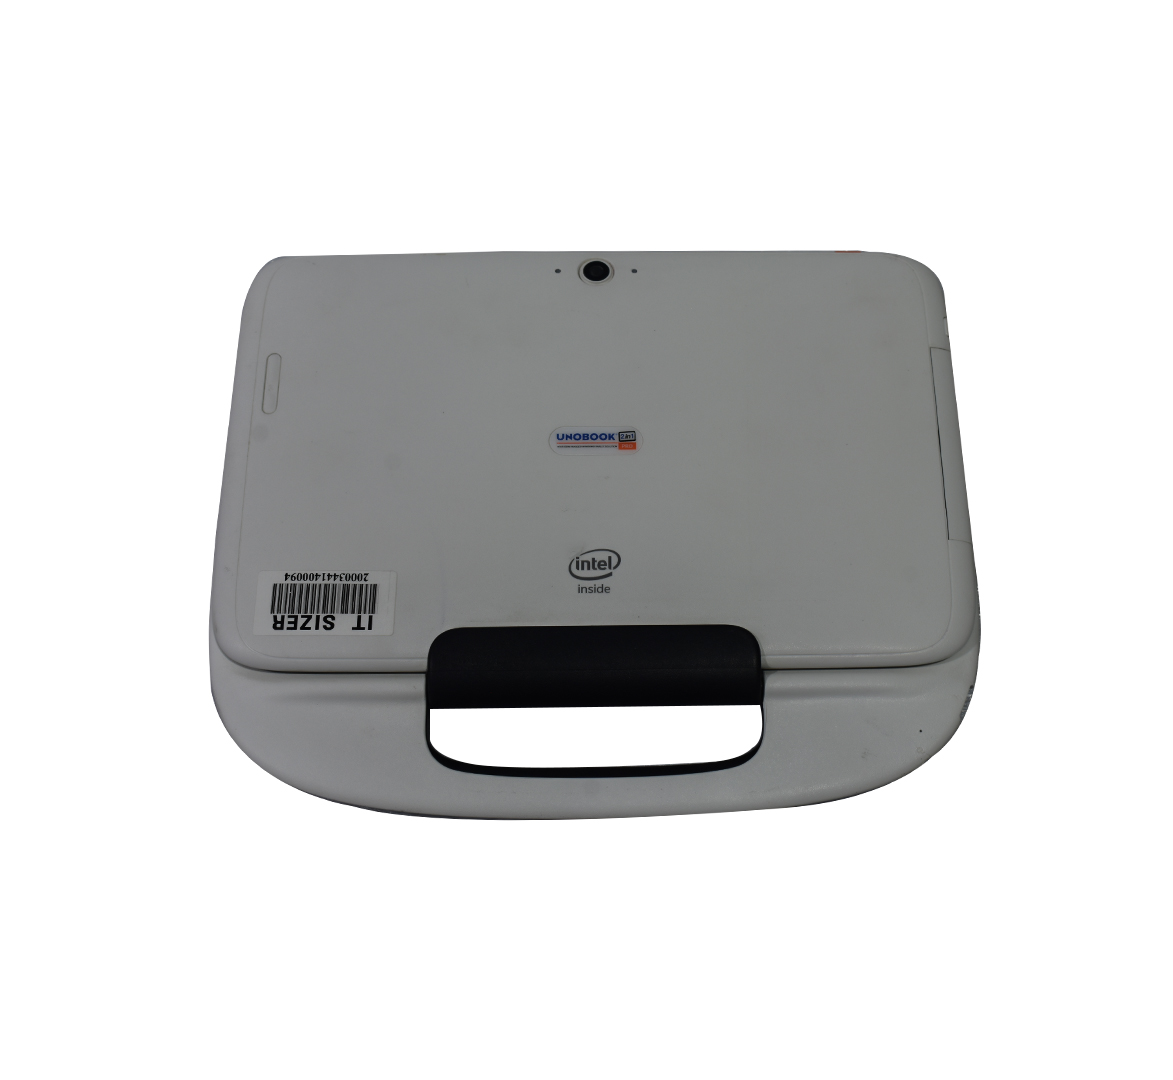 CTL 2 Go PC NL5 (2-in-1) Laptop, Intel ATOM CPU, 2GB DDR3 BUILTIN RAM, 64GB SSD M2, 10 inch Touch Display (Refurbished)